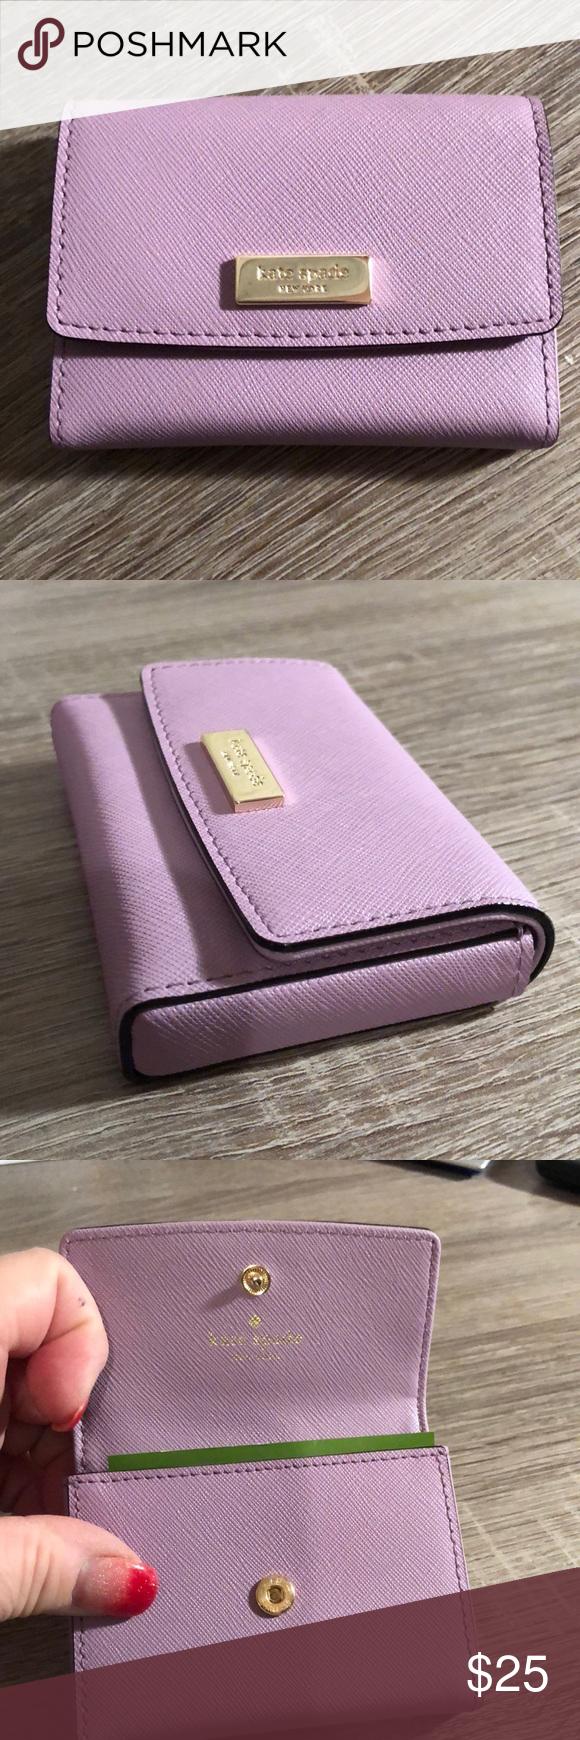 kate spade business card holder purple wlru2668  kate